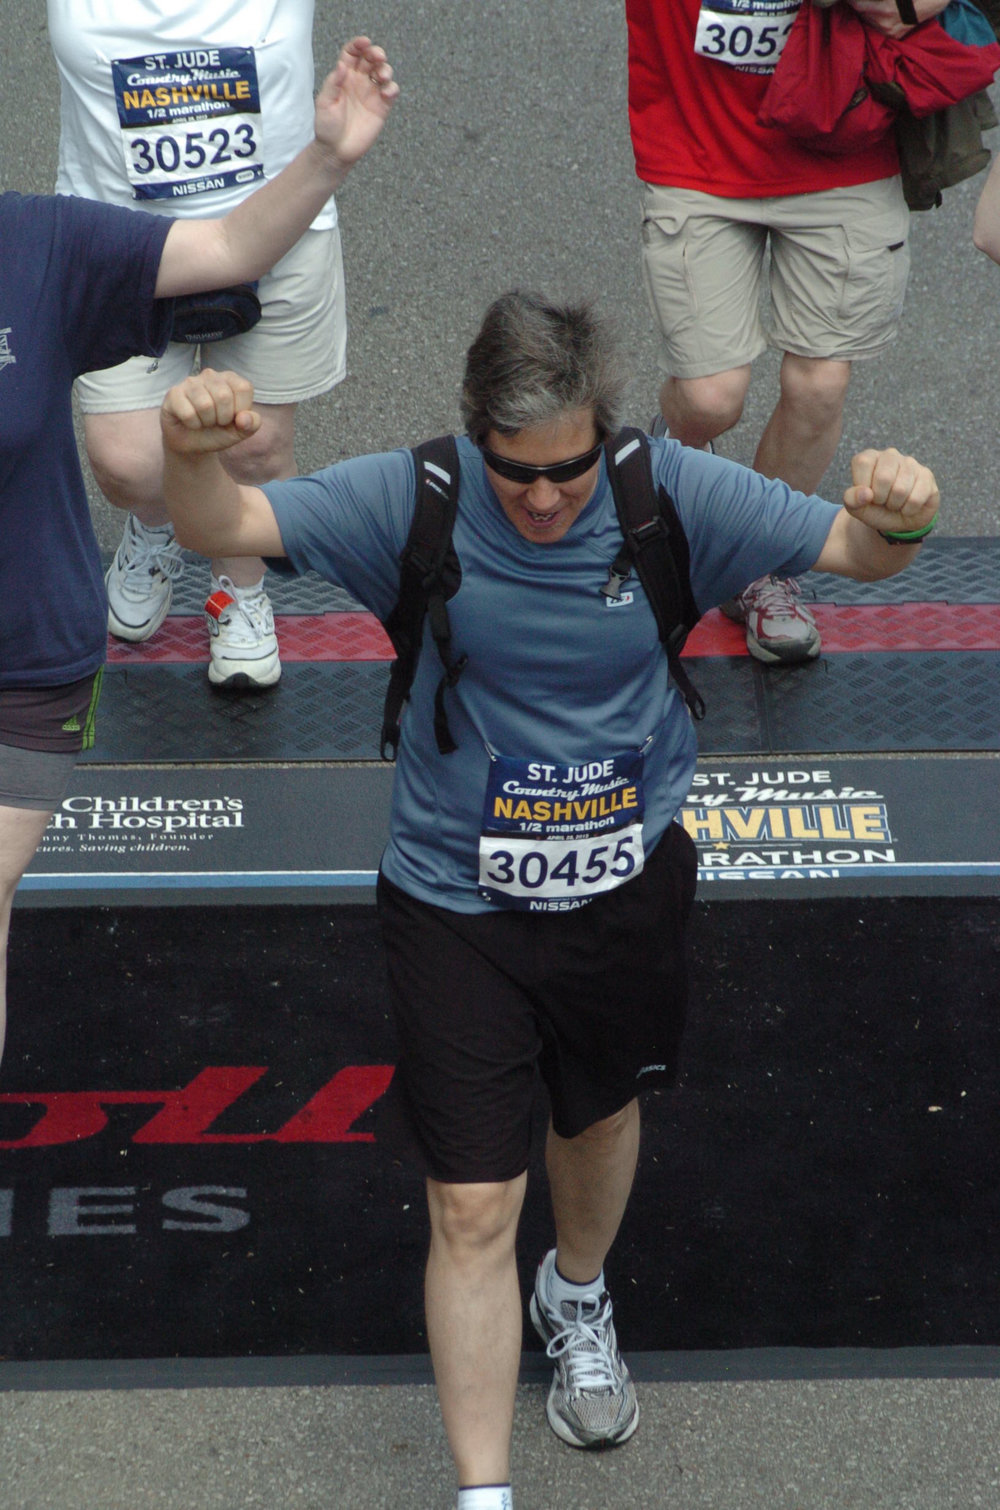 Marathon Photo.jpg